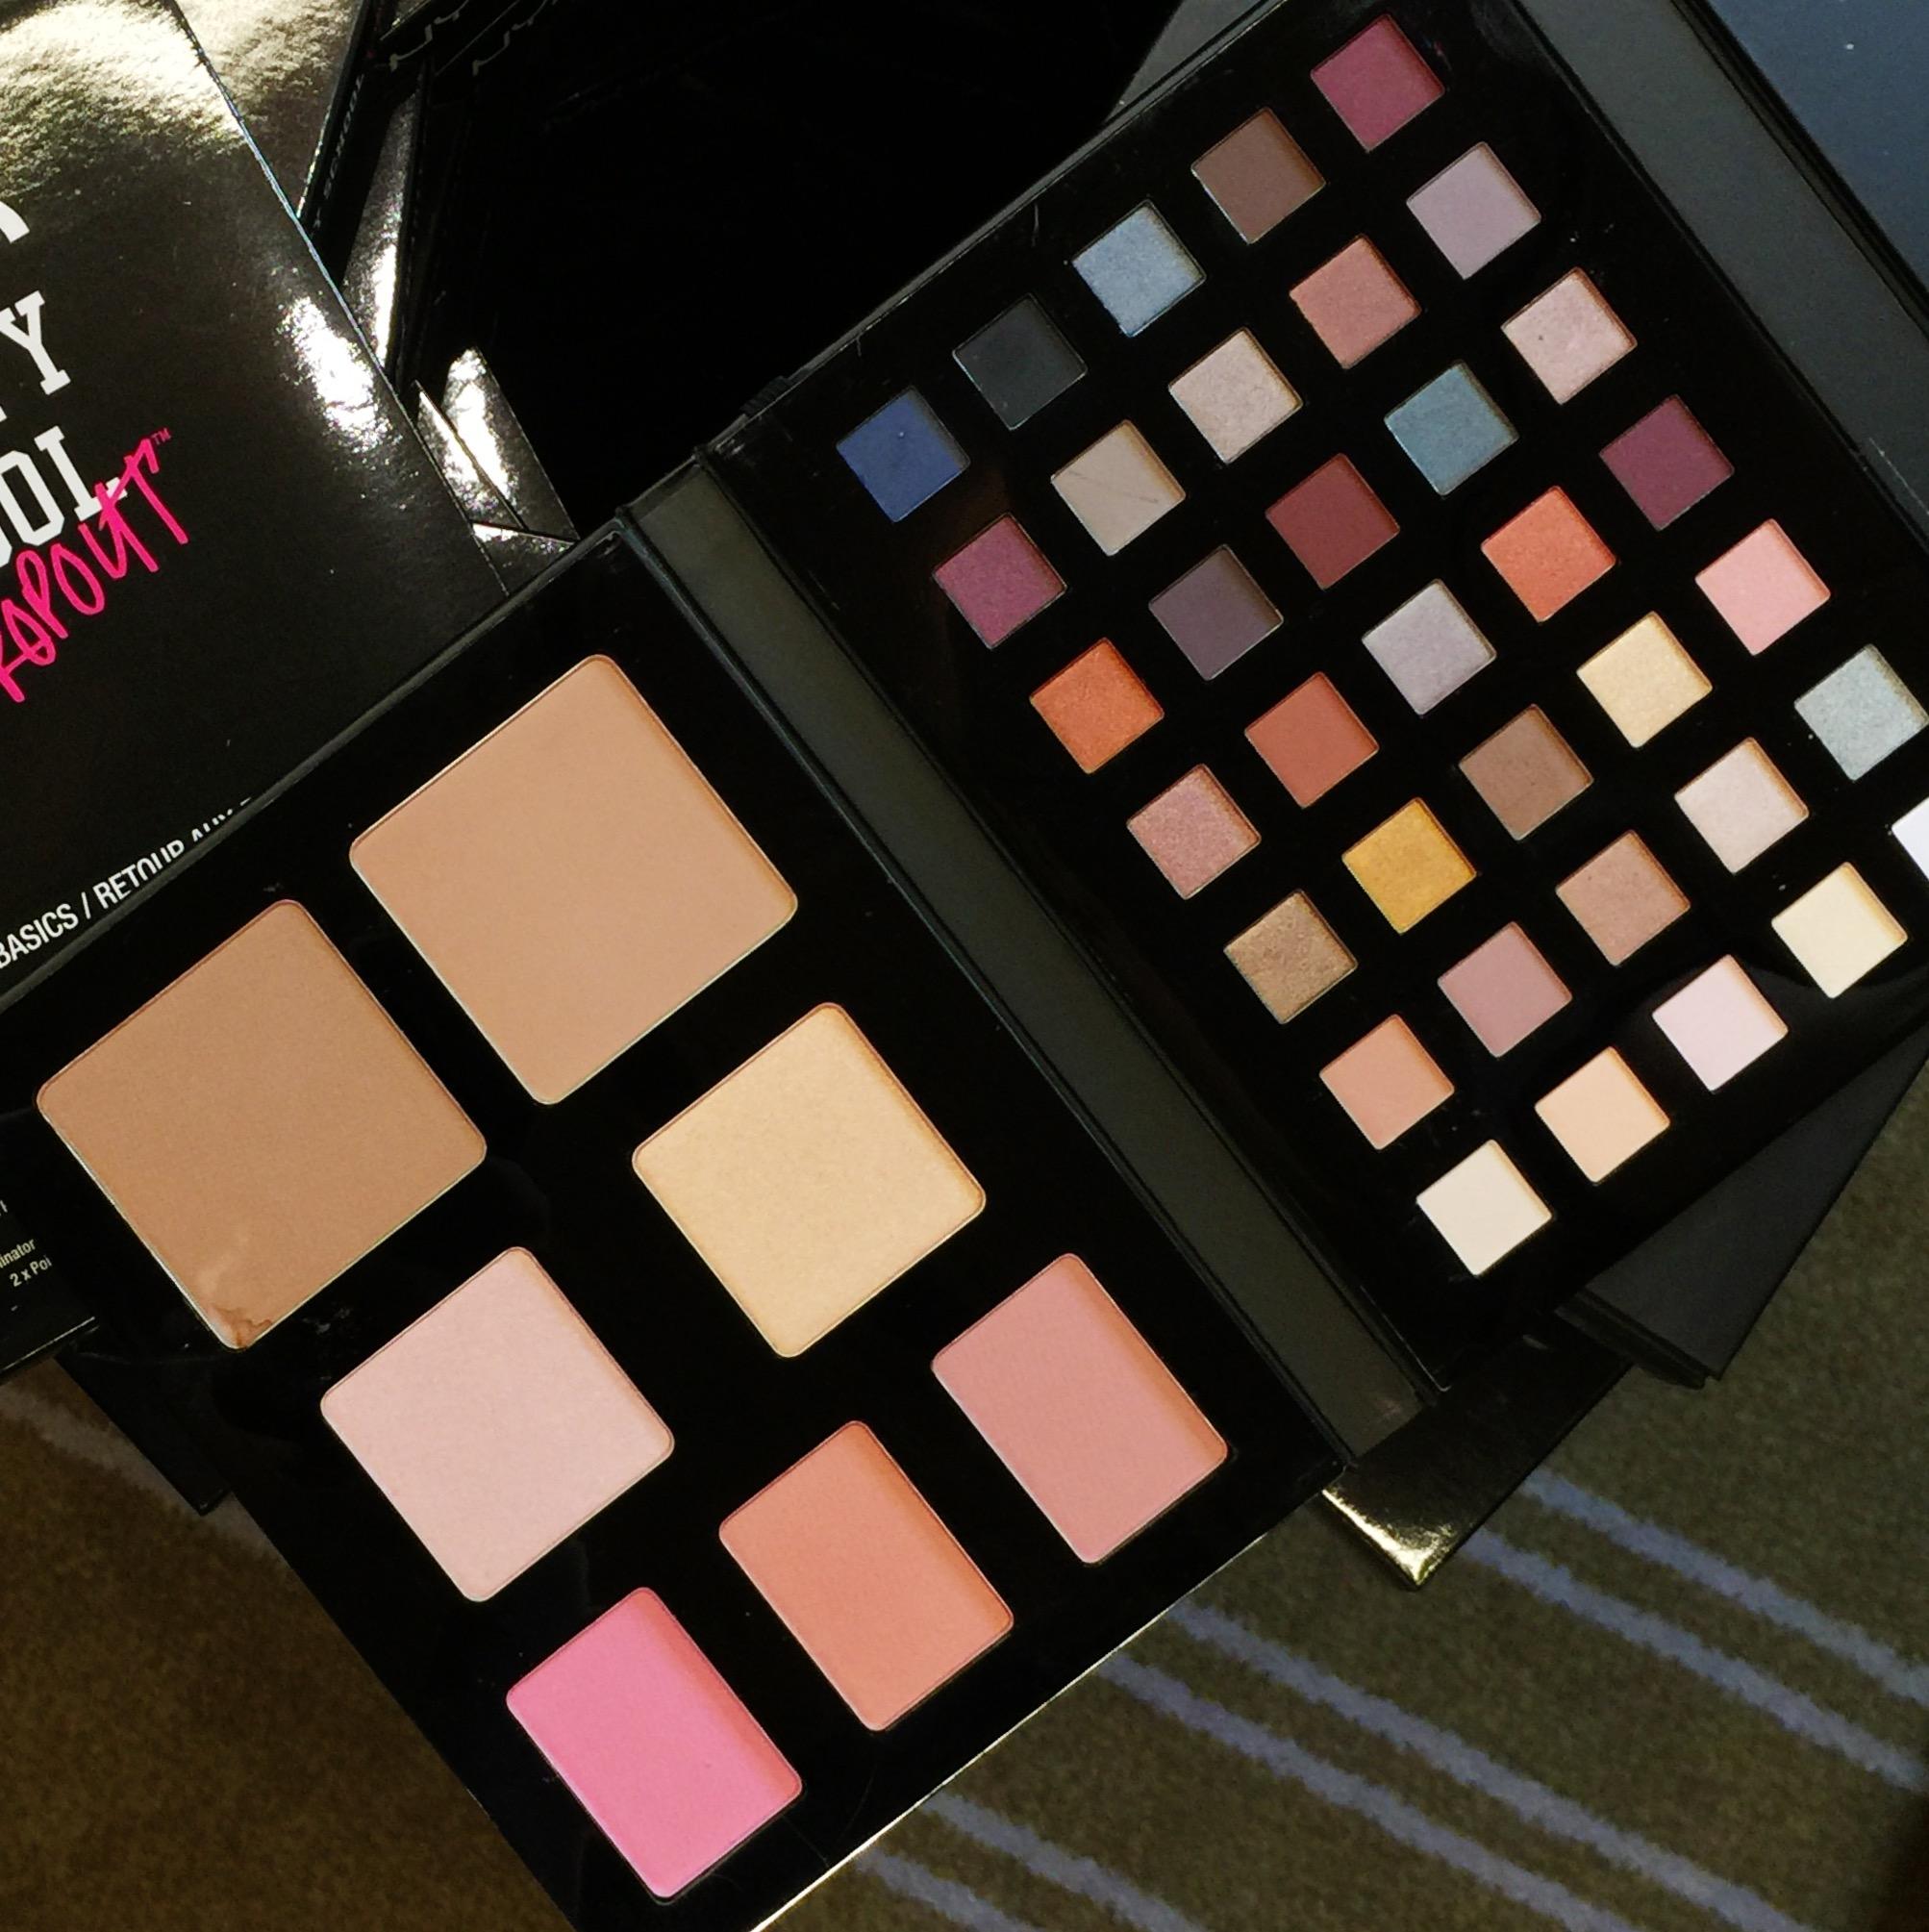 Marisa Robinson Beauty Blogger Priceline: The Beauty Prescription Event 2017 NYX Eyeshadow Palette